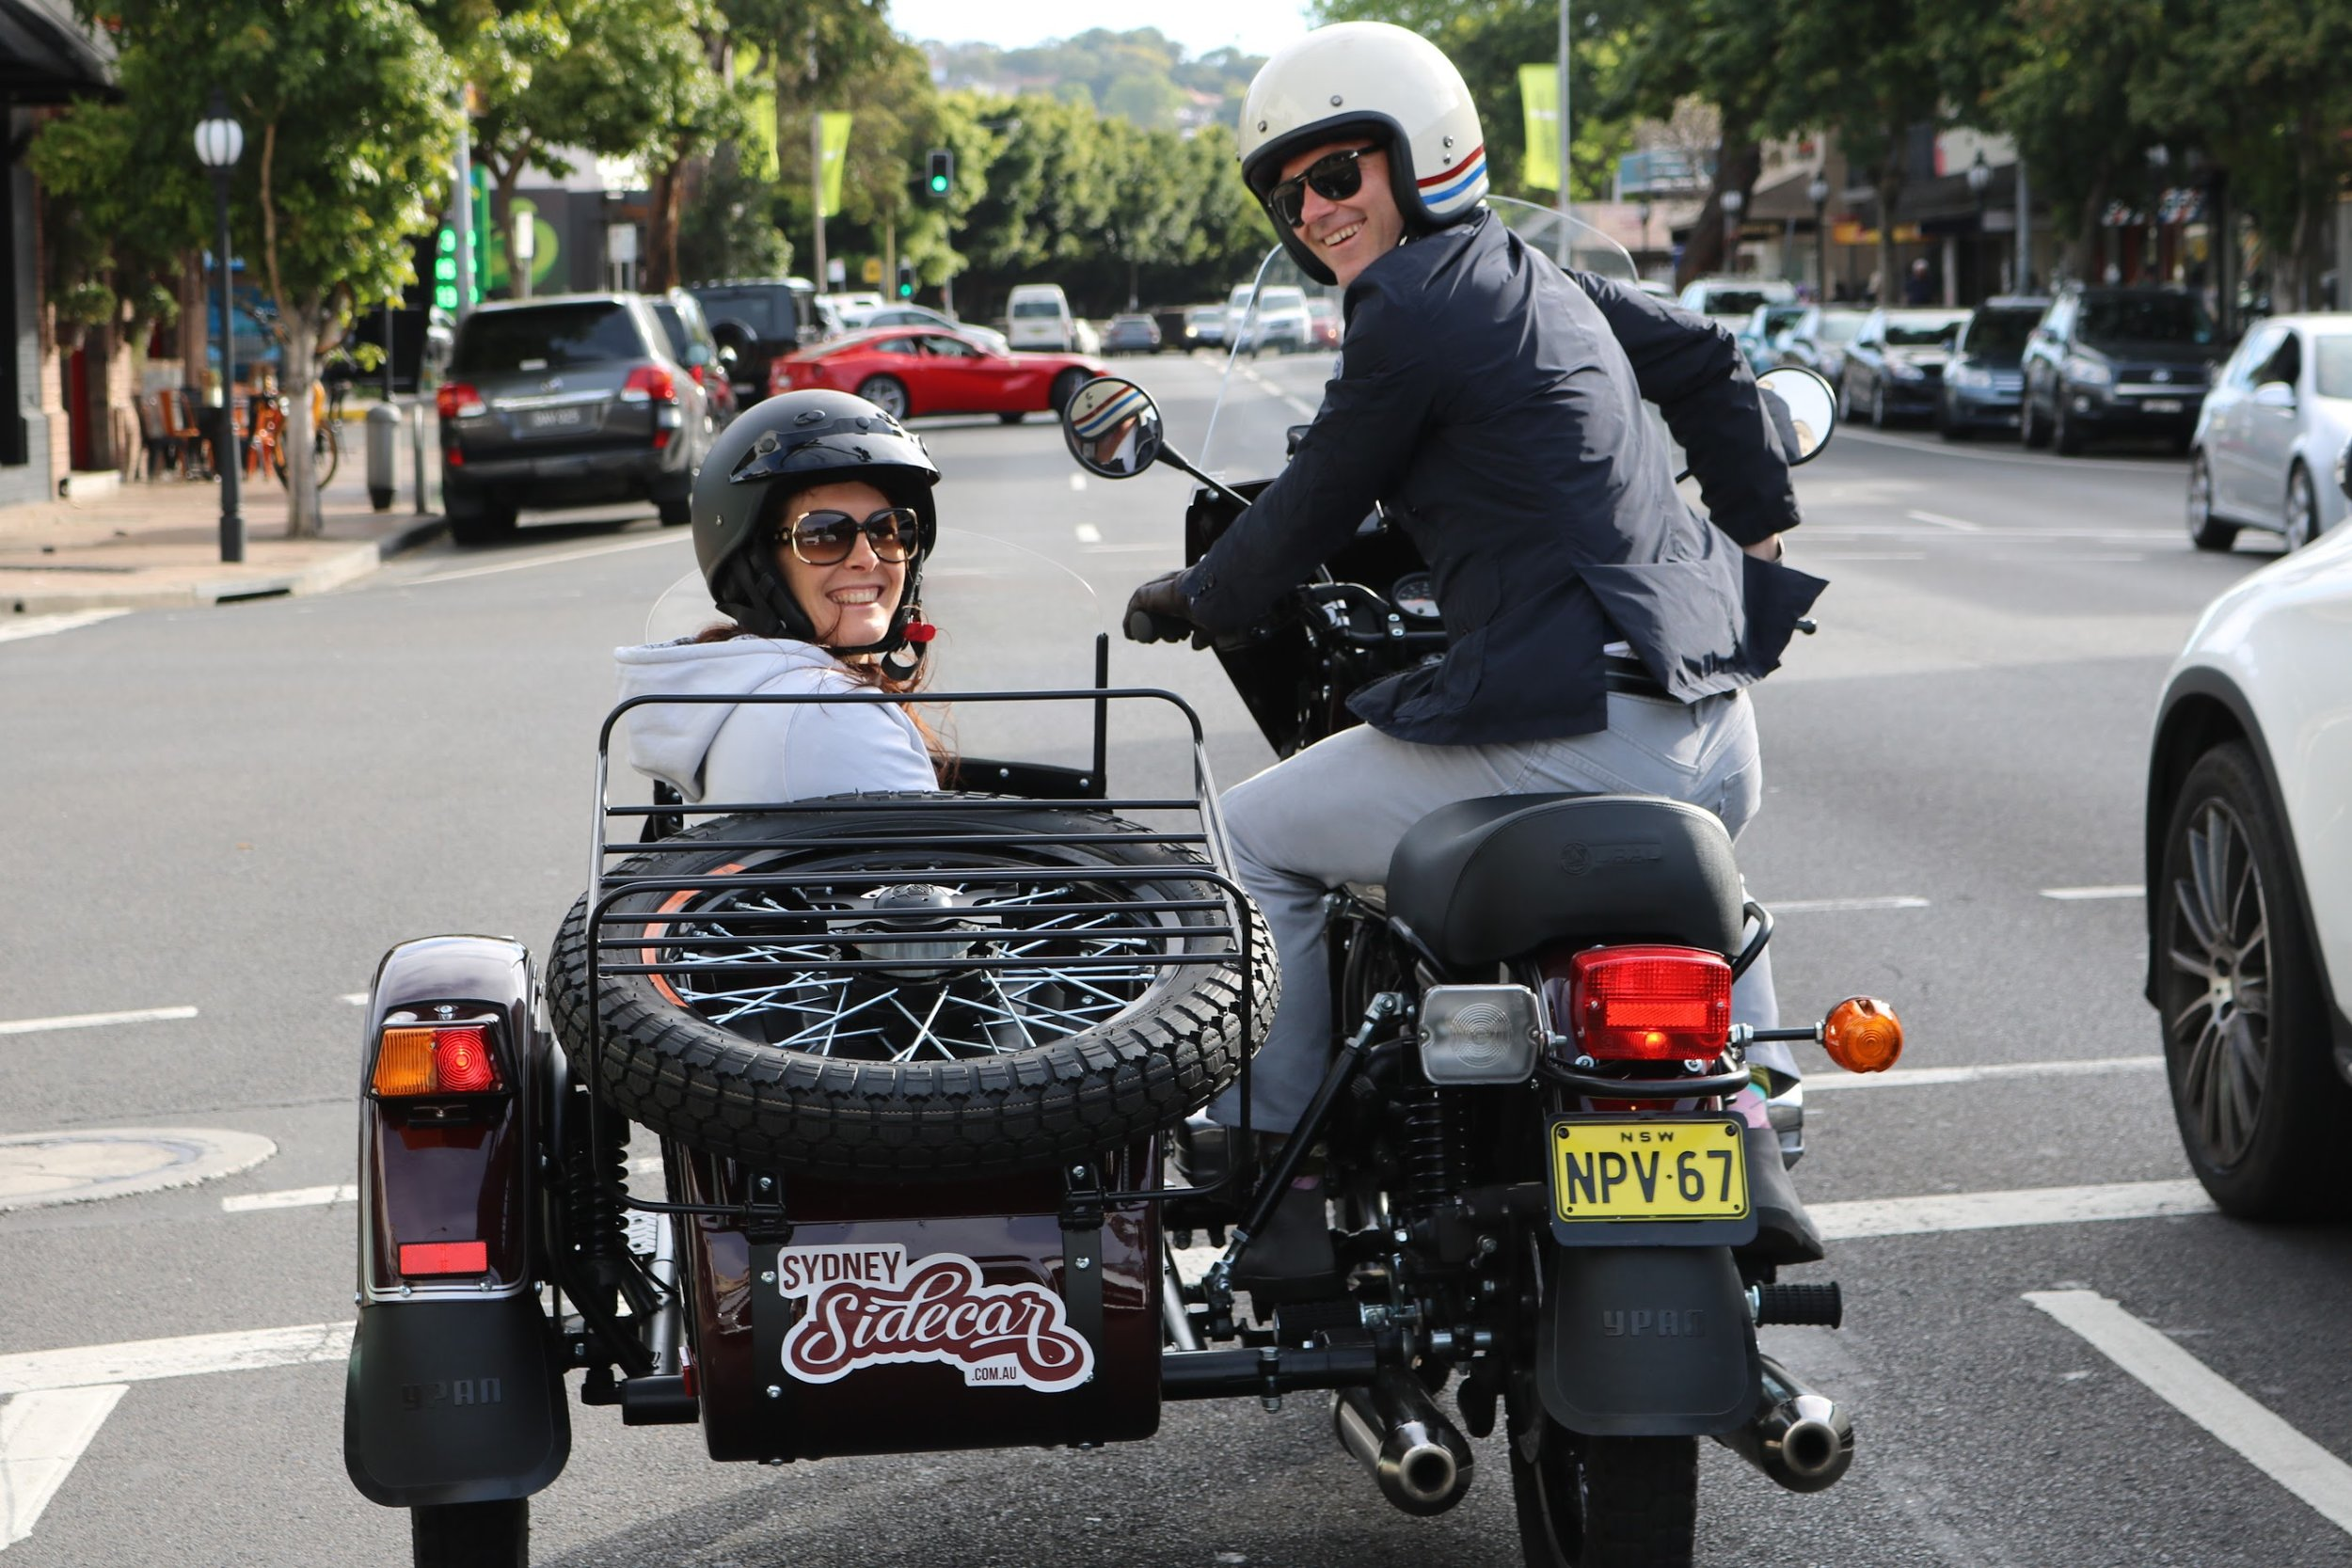 sydney-sidecar-experience-offbeat-rose-bay.JPG